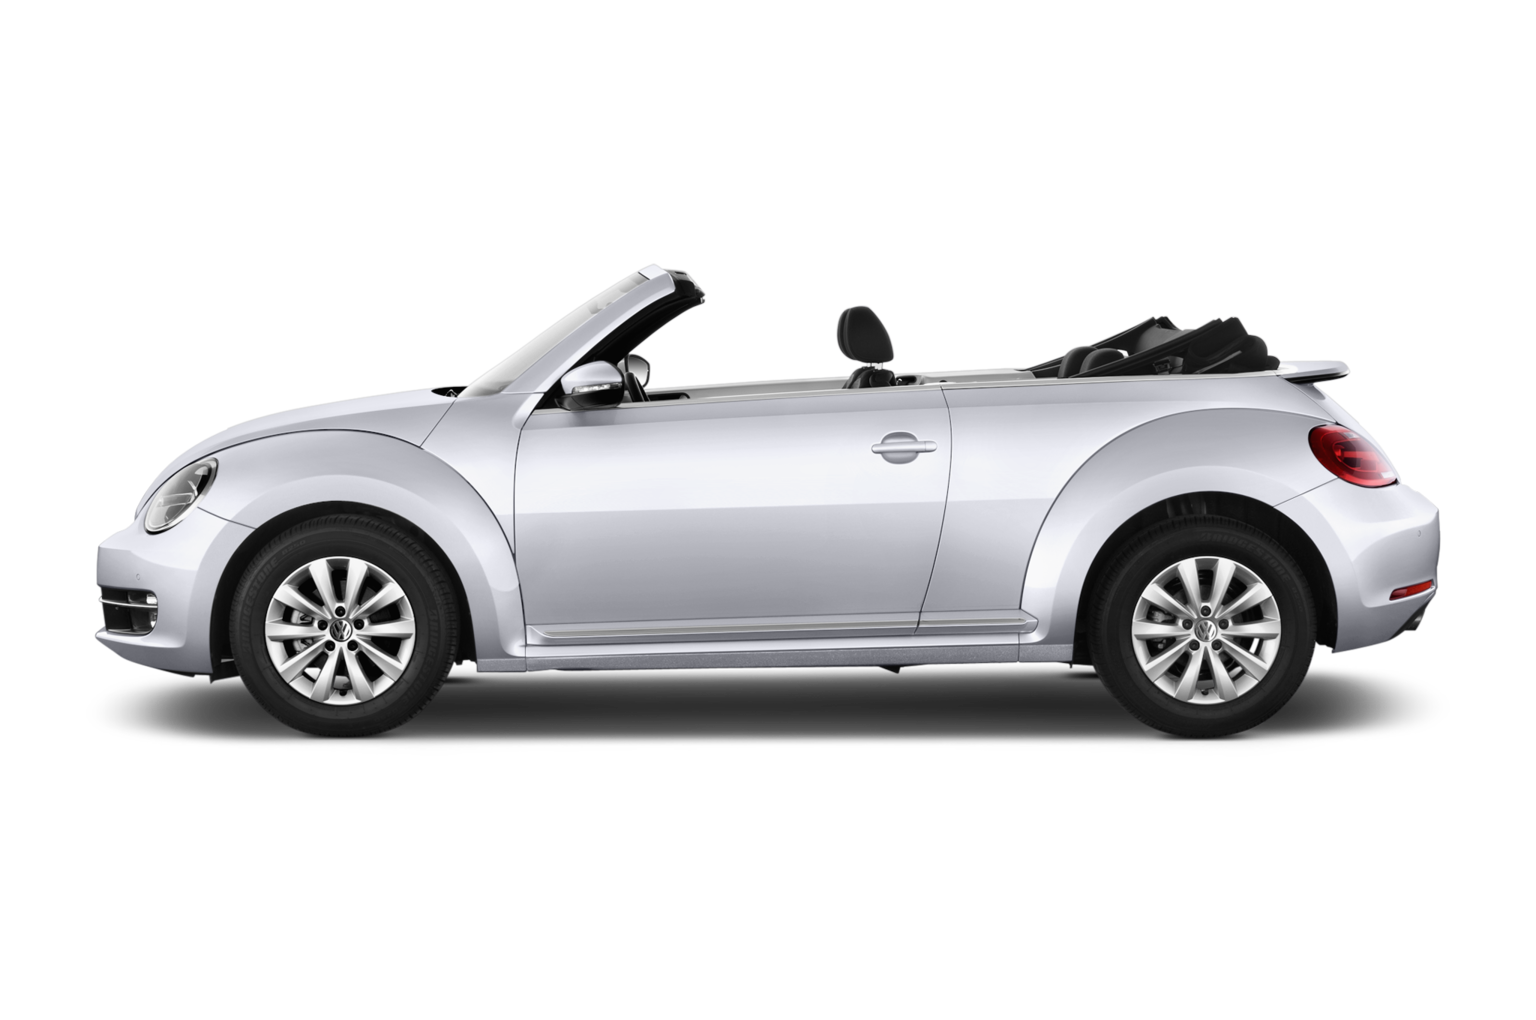 volkswagen beetle cabrio 5c7 gebrauchtwagen neuwagen. Black Bedroom Furniture Sets. Home Design Ideas